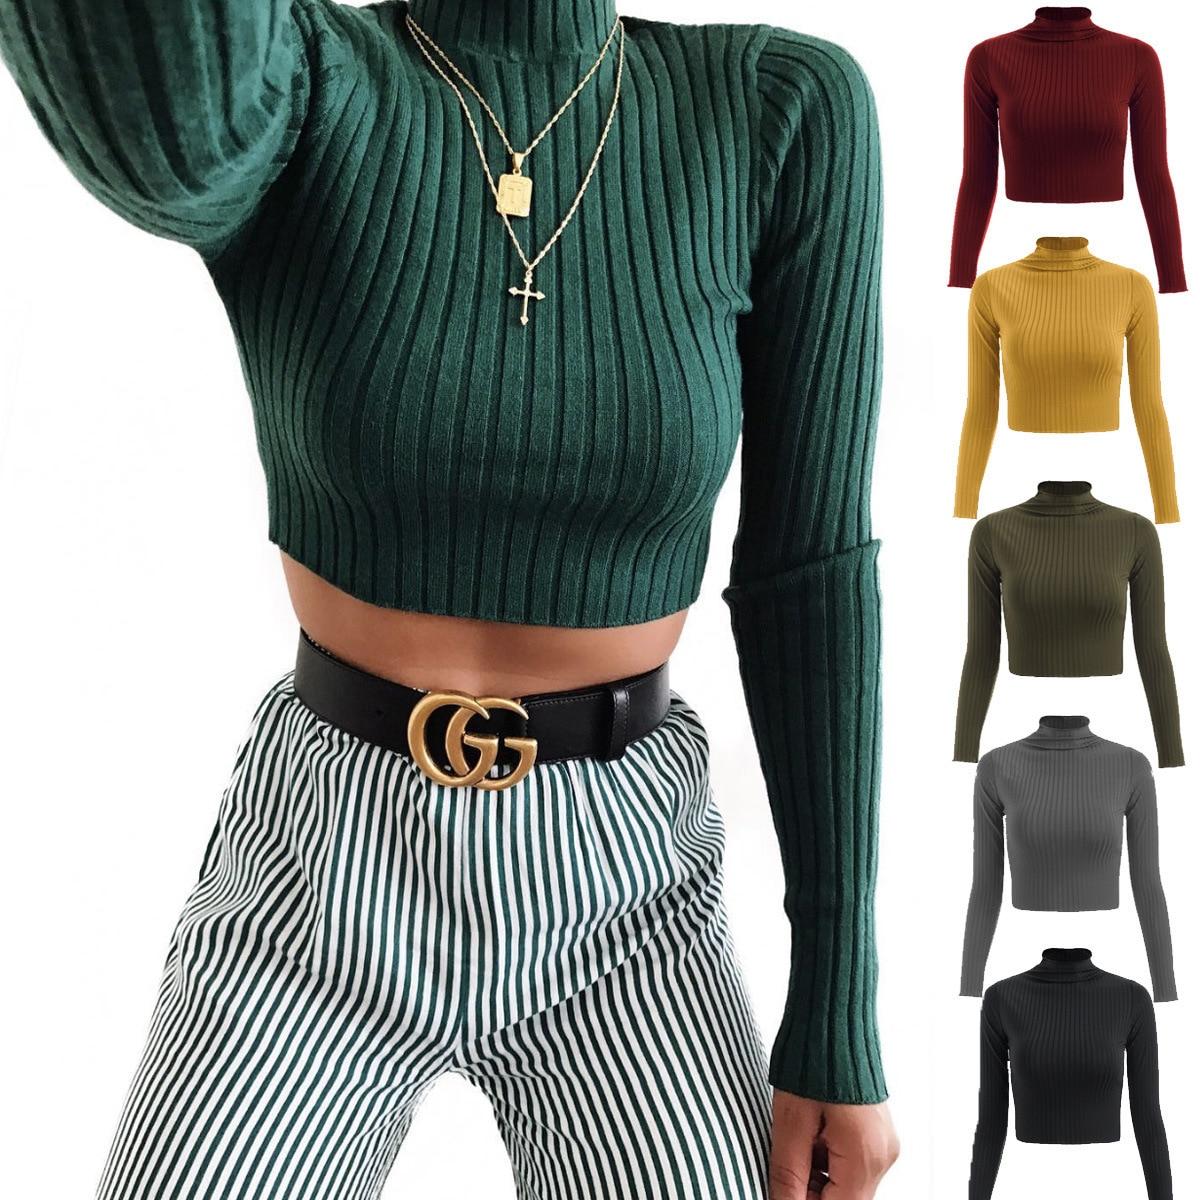 T-Shirt Women Turtleneck Spring Long-Sleeve Hilum Autumn WSL3201 Show Pure-Color New